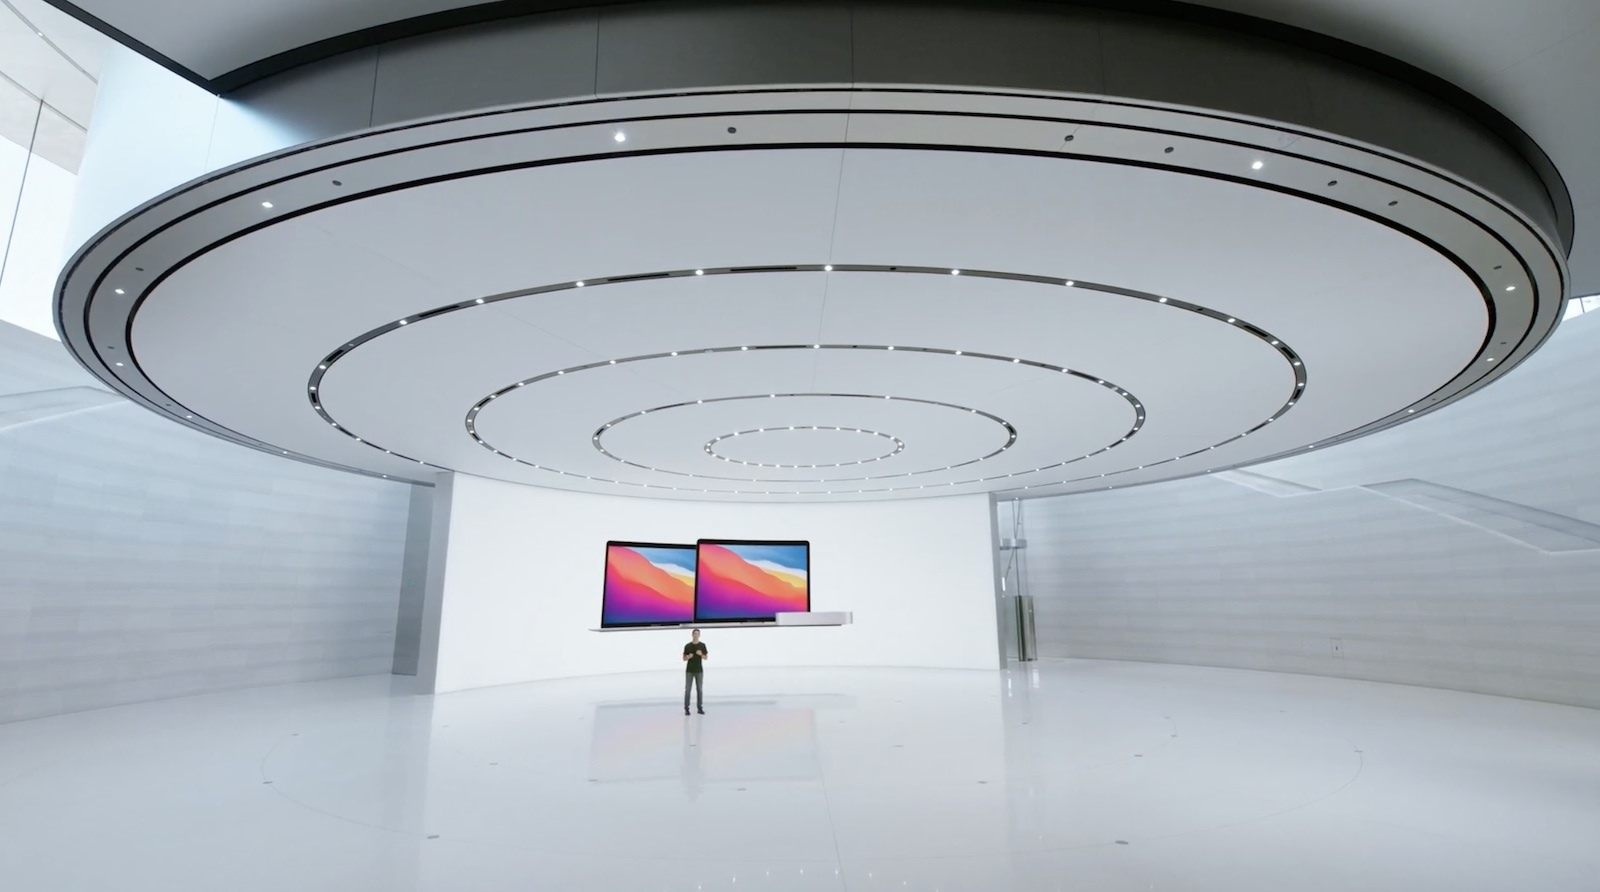 M1 mac announcement